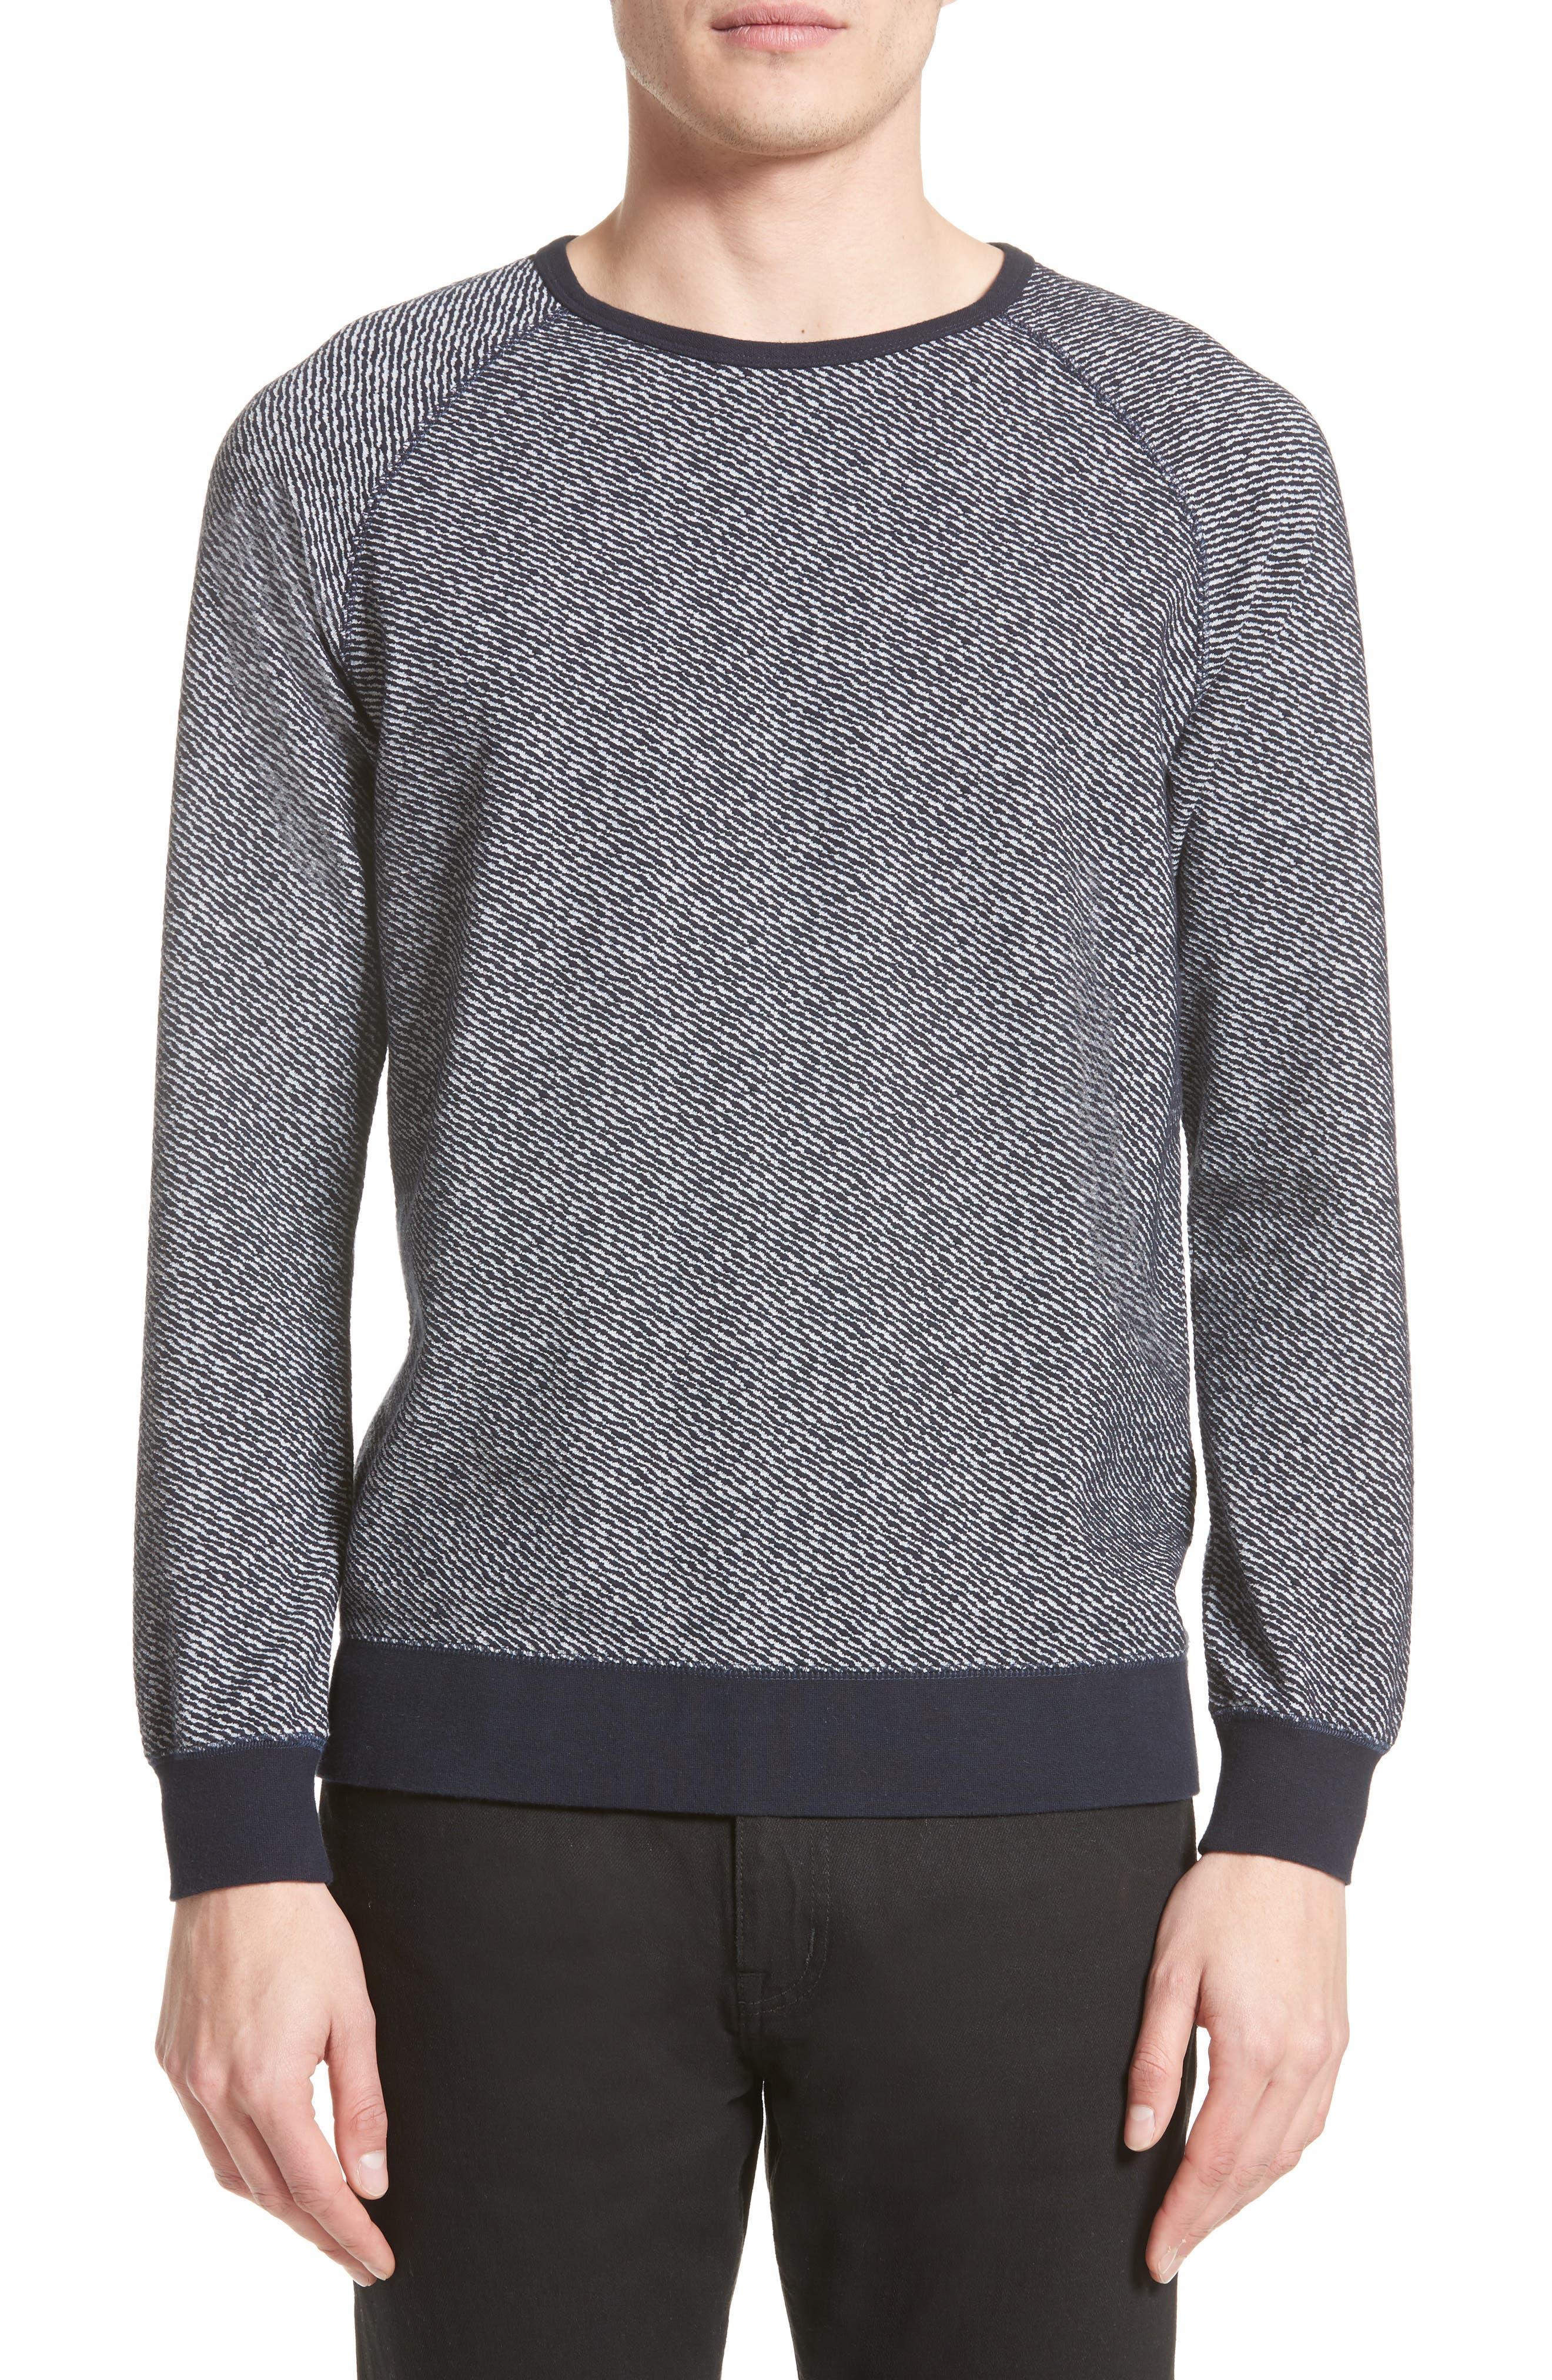 Kasu Sweater,                             Main thumbnail 2, color,